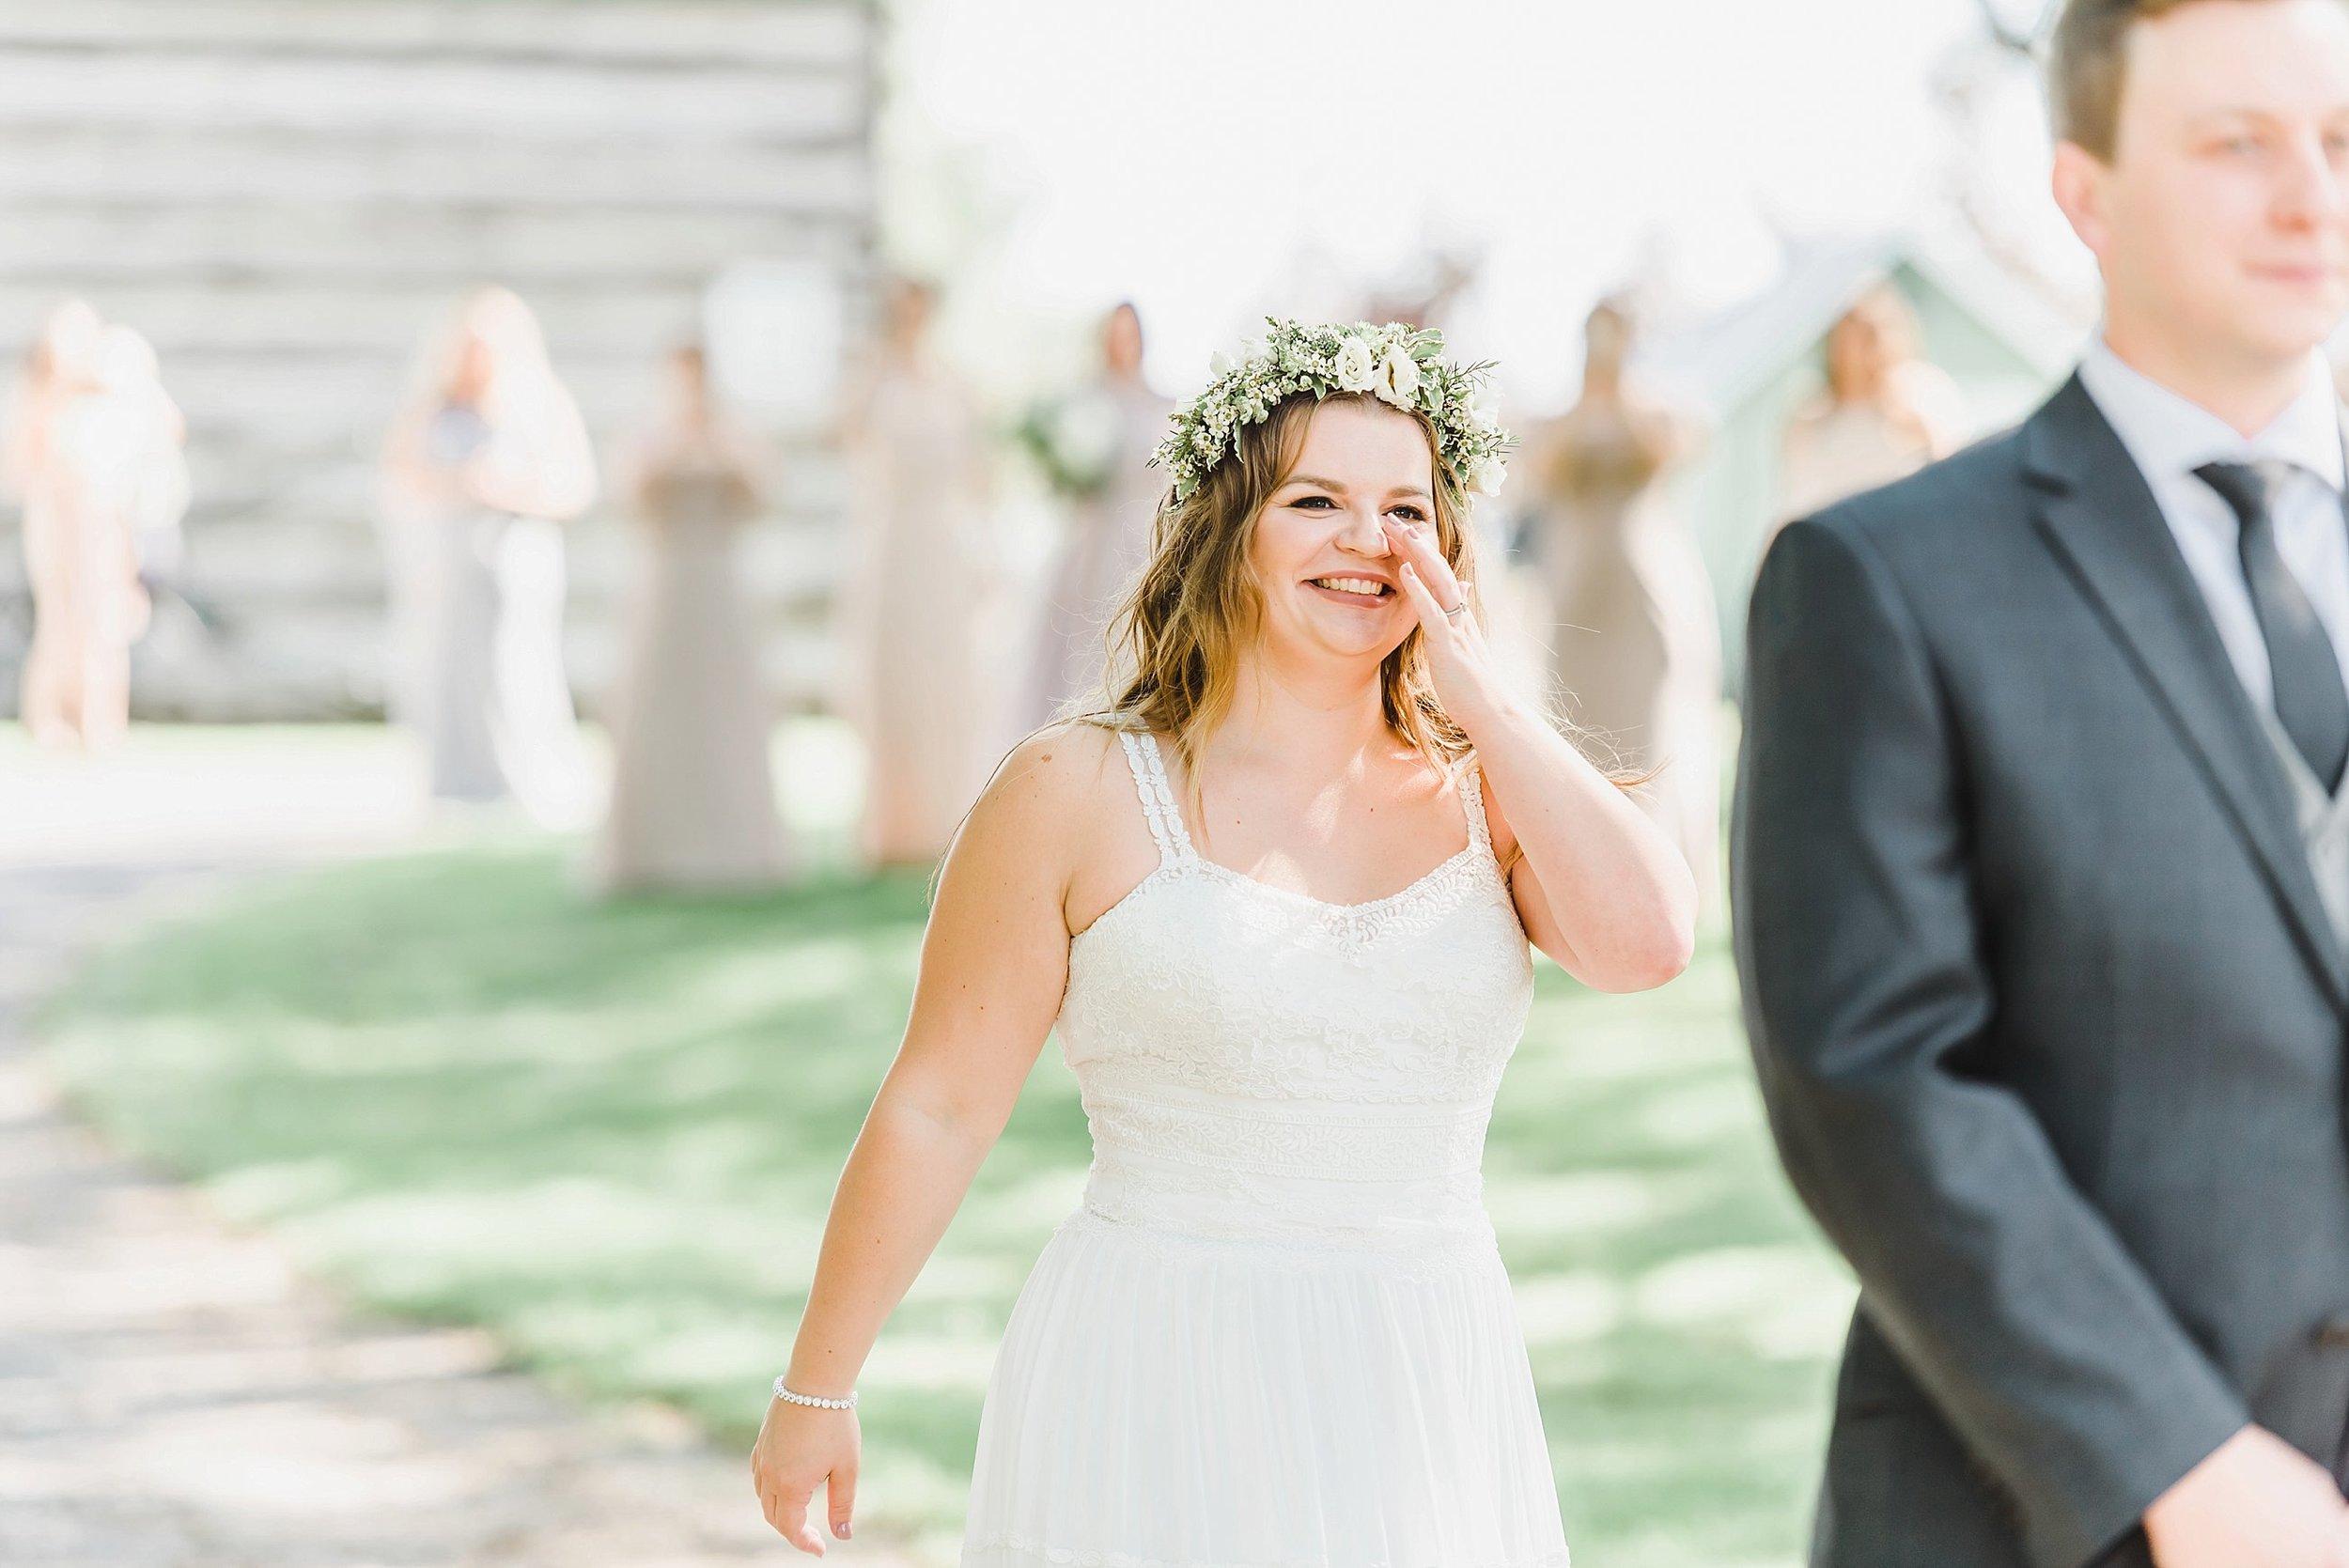 light airy indie fine art ottawa wedding photographer | Ali and Batoul Photography_1083.jpg